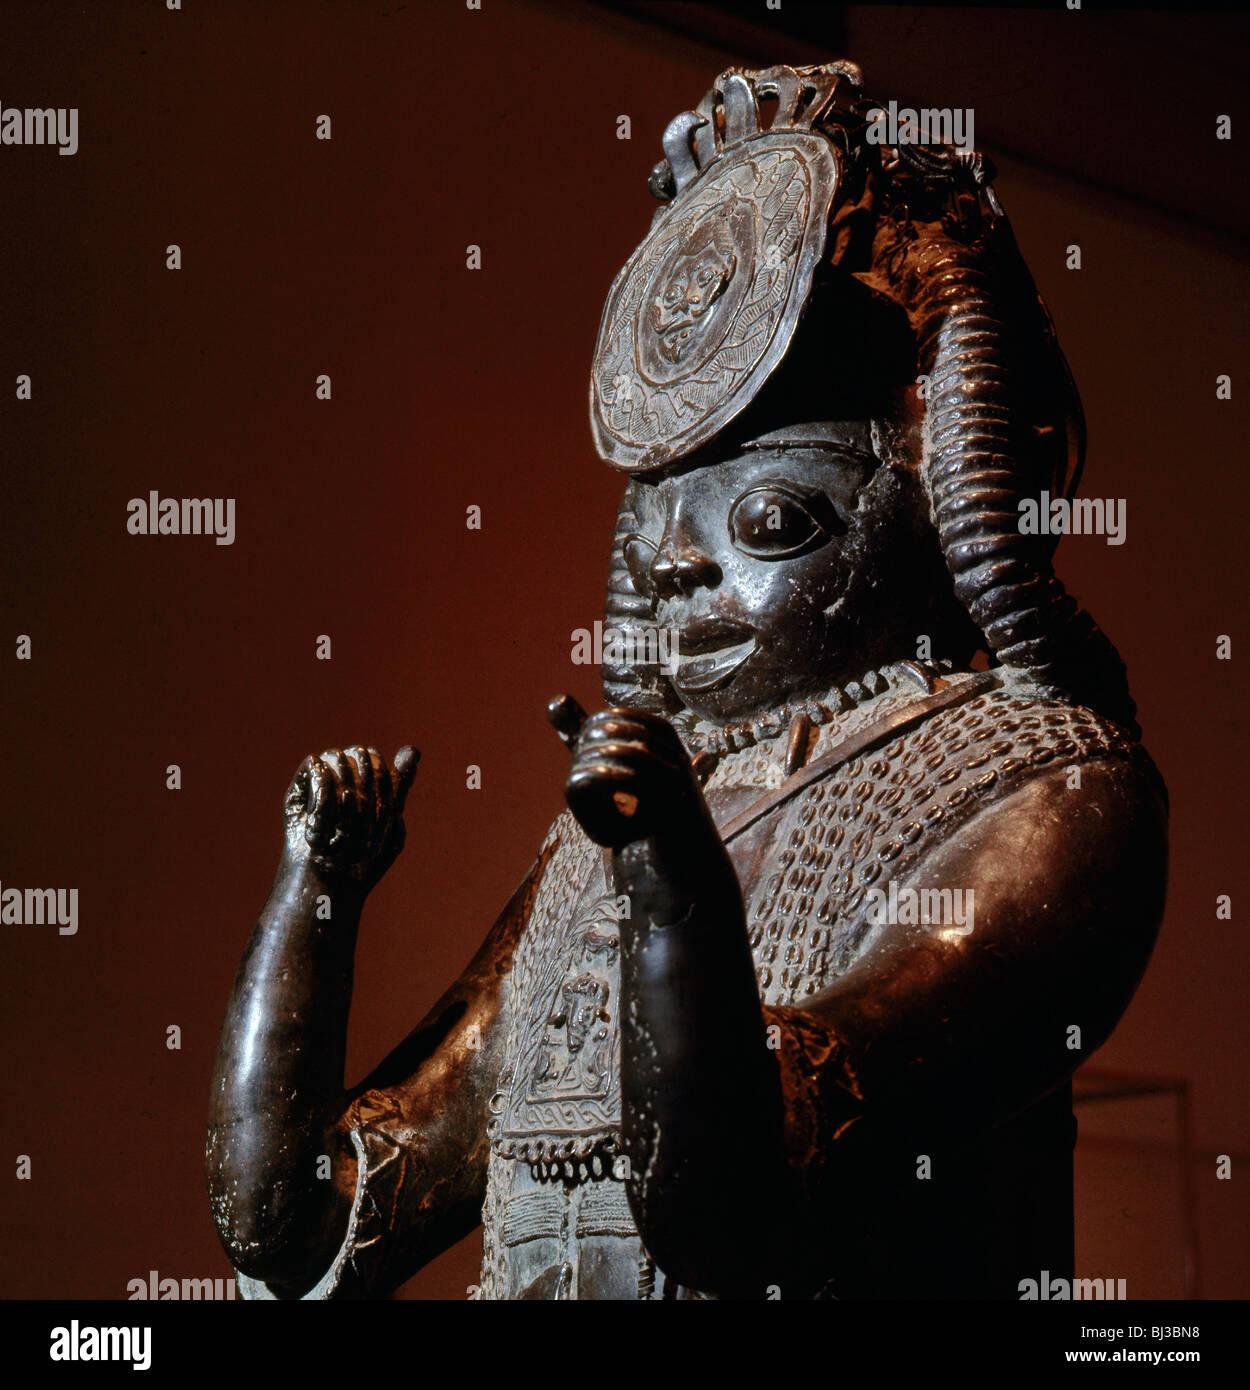 Tsoede bronze, from Tada, Nigeria, c14th-15th century. Artist: Werner Forman - Stock Image